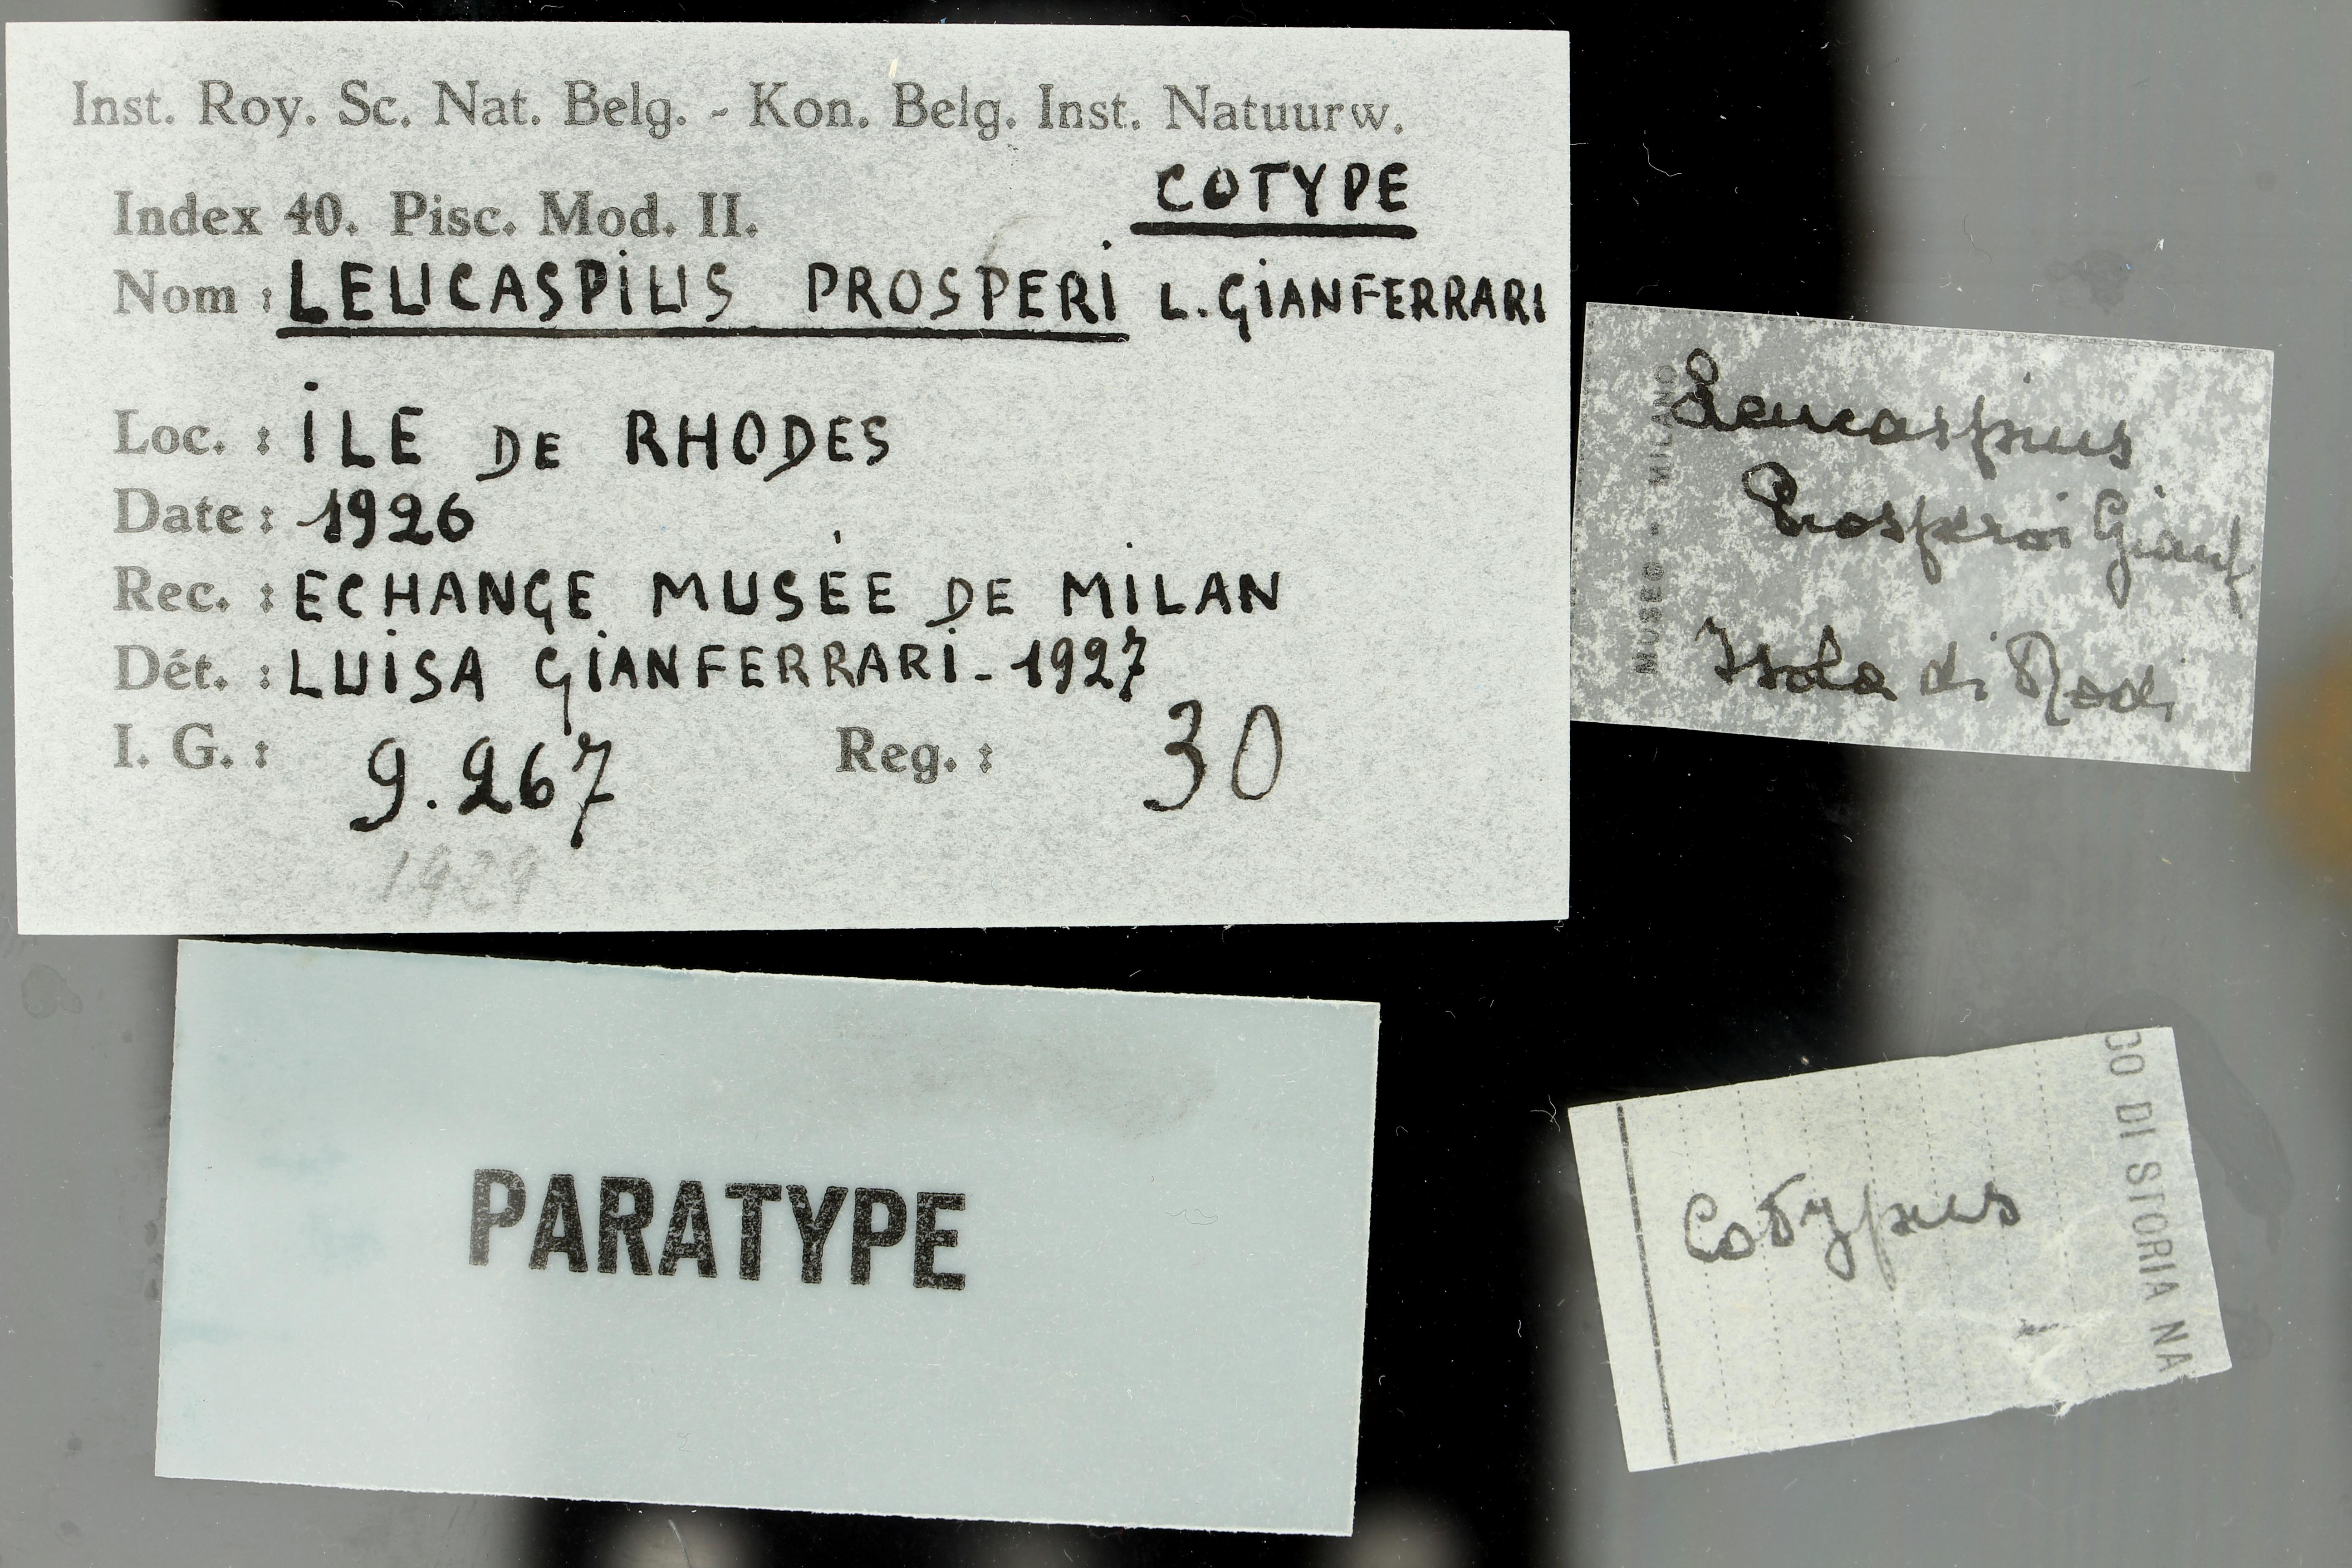 30 Leucaspius prosperi 9267 ticket.jpg